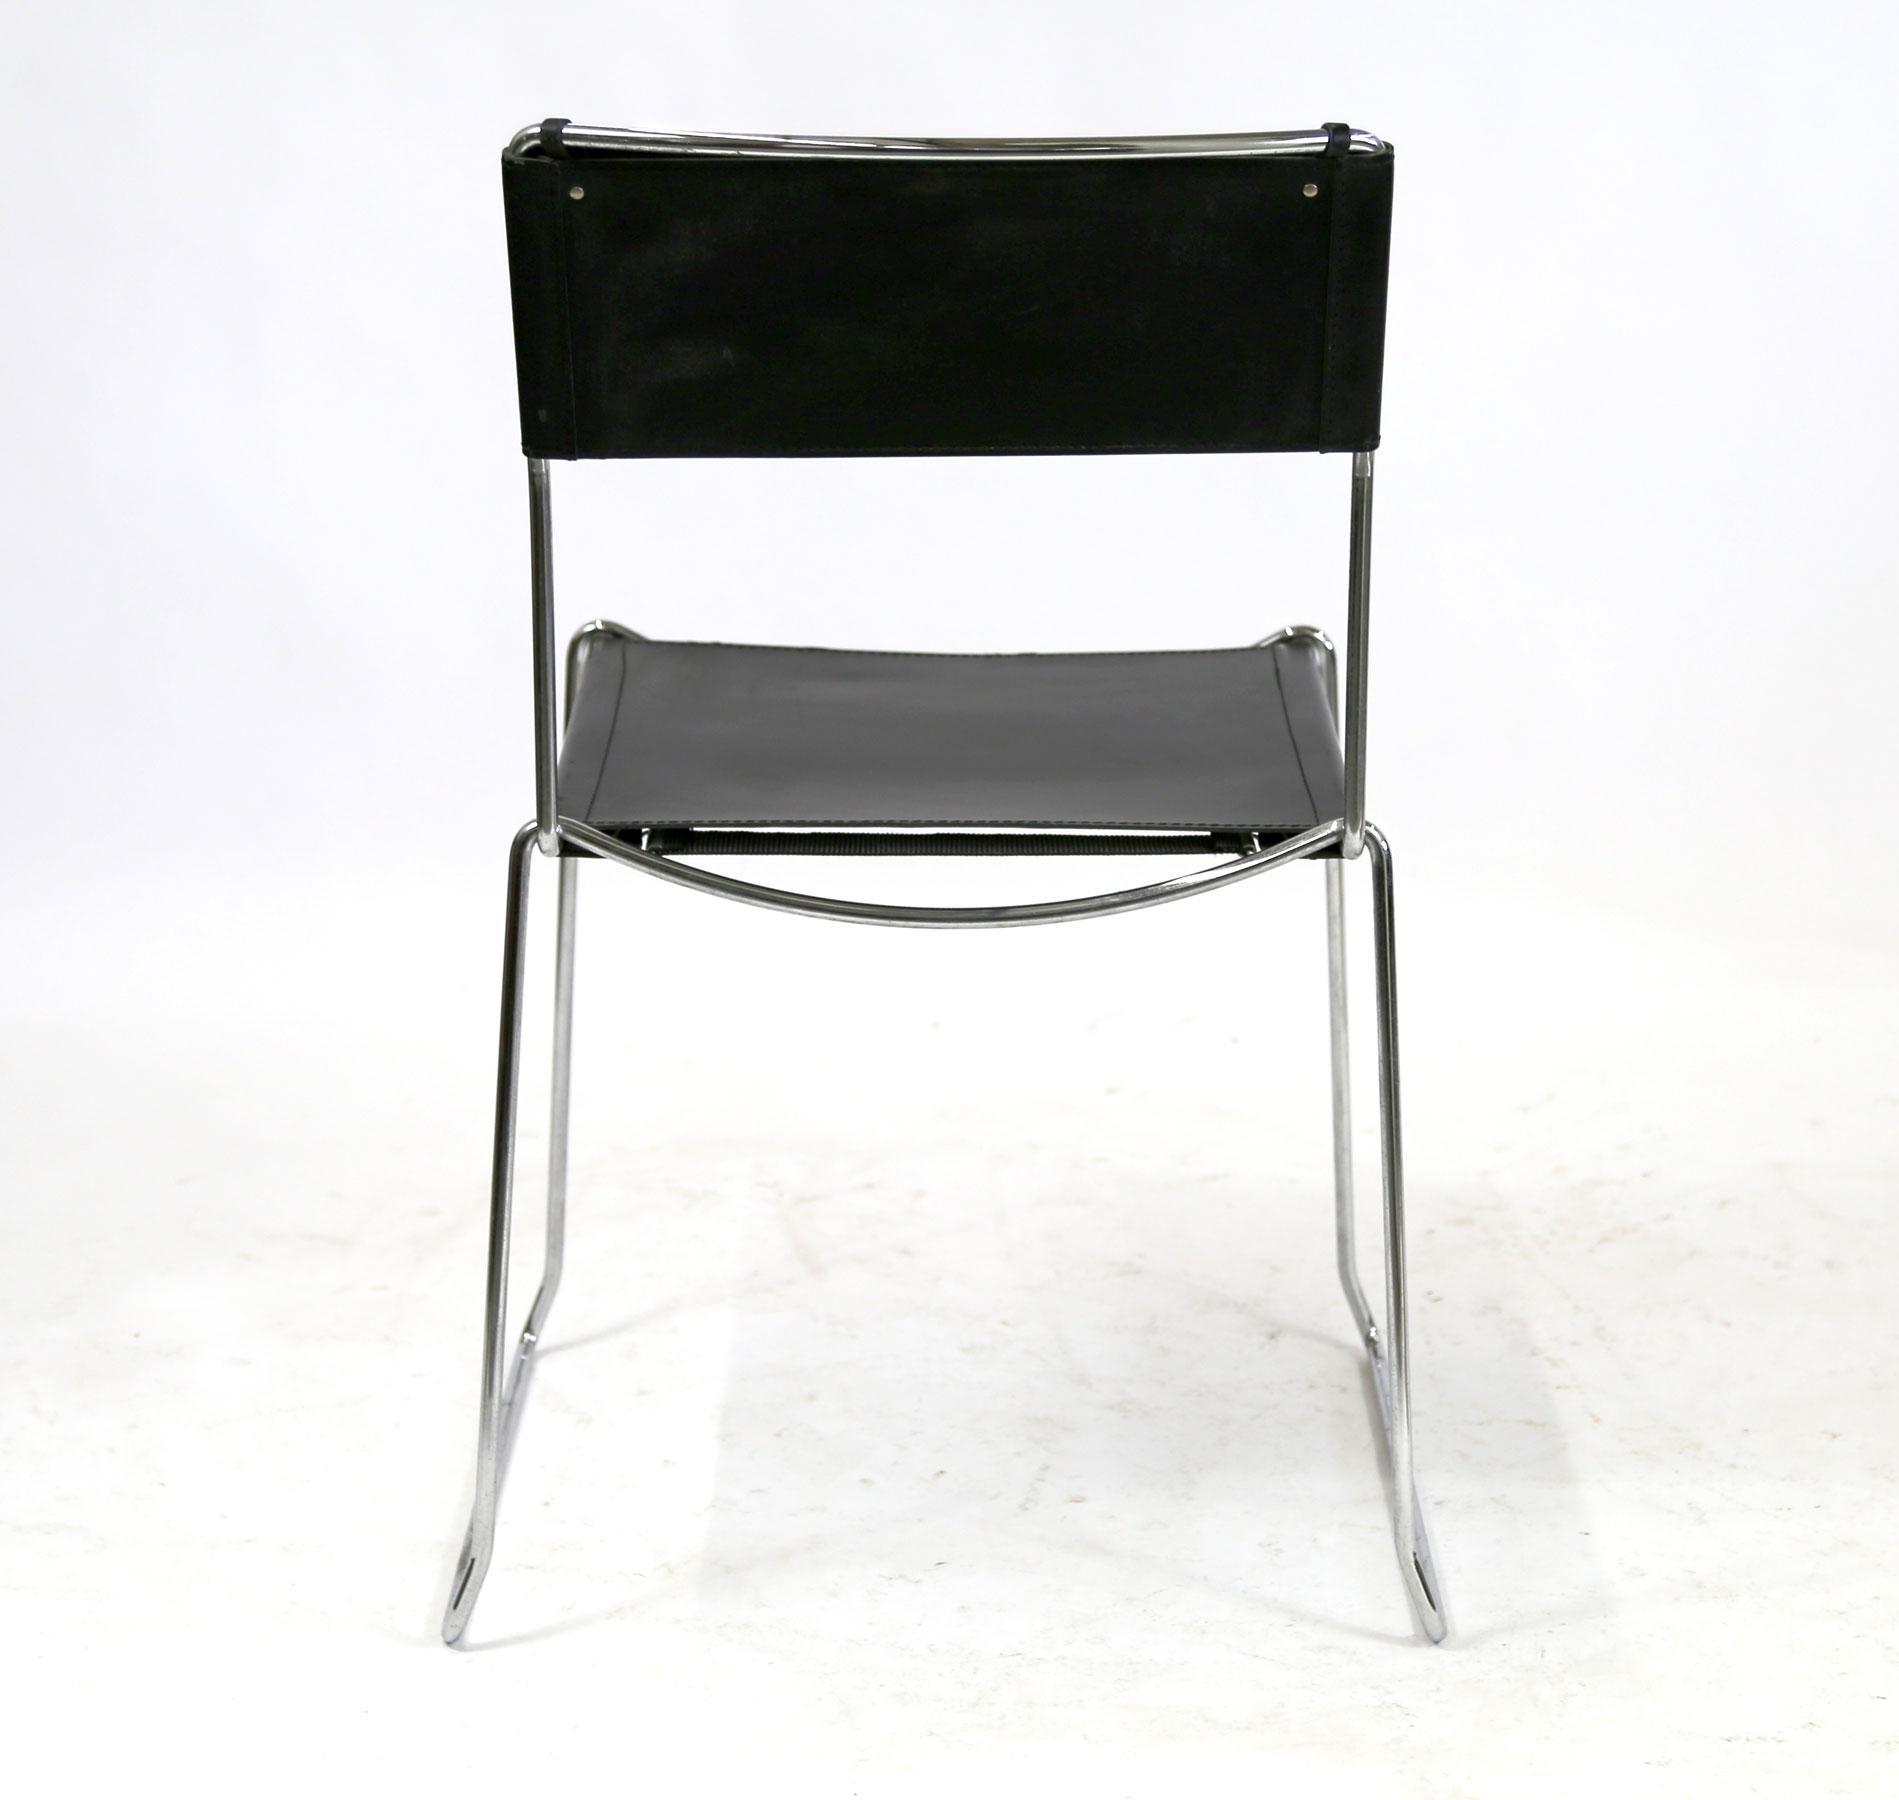 leather chrome chair power wheelchair bags italian made bauhaus black chairish 1990s for sale image 5 of 11